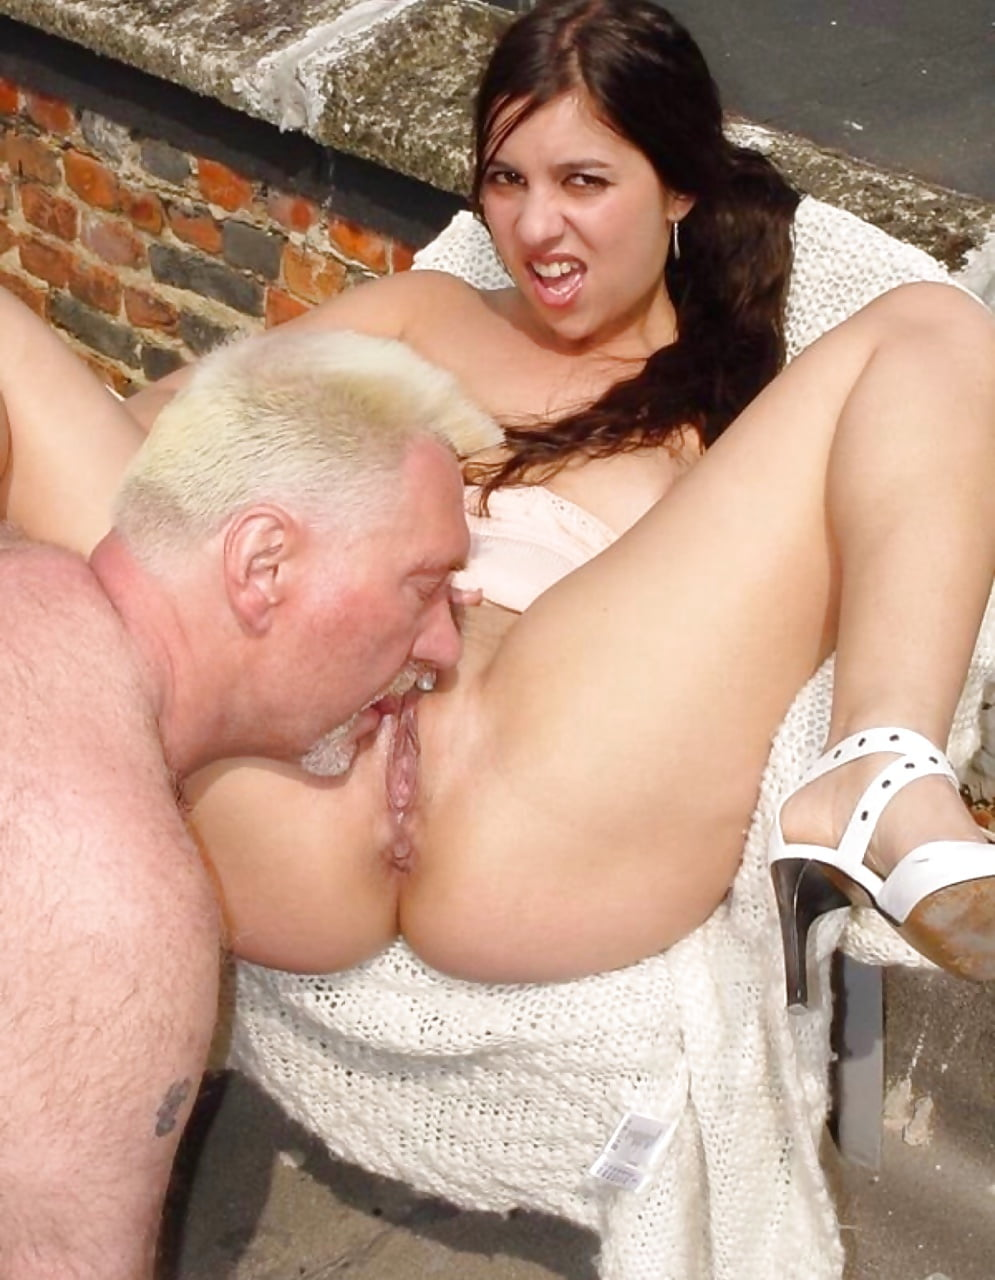 porno-kunilingus-sochniy-professionali-stariki